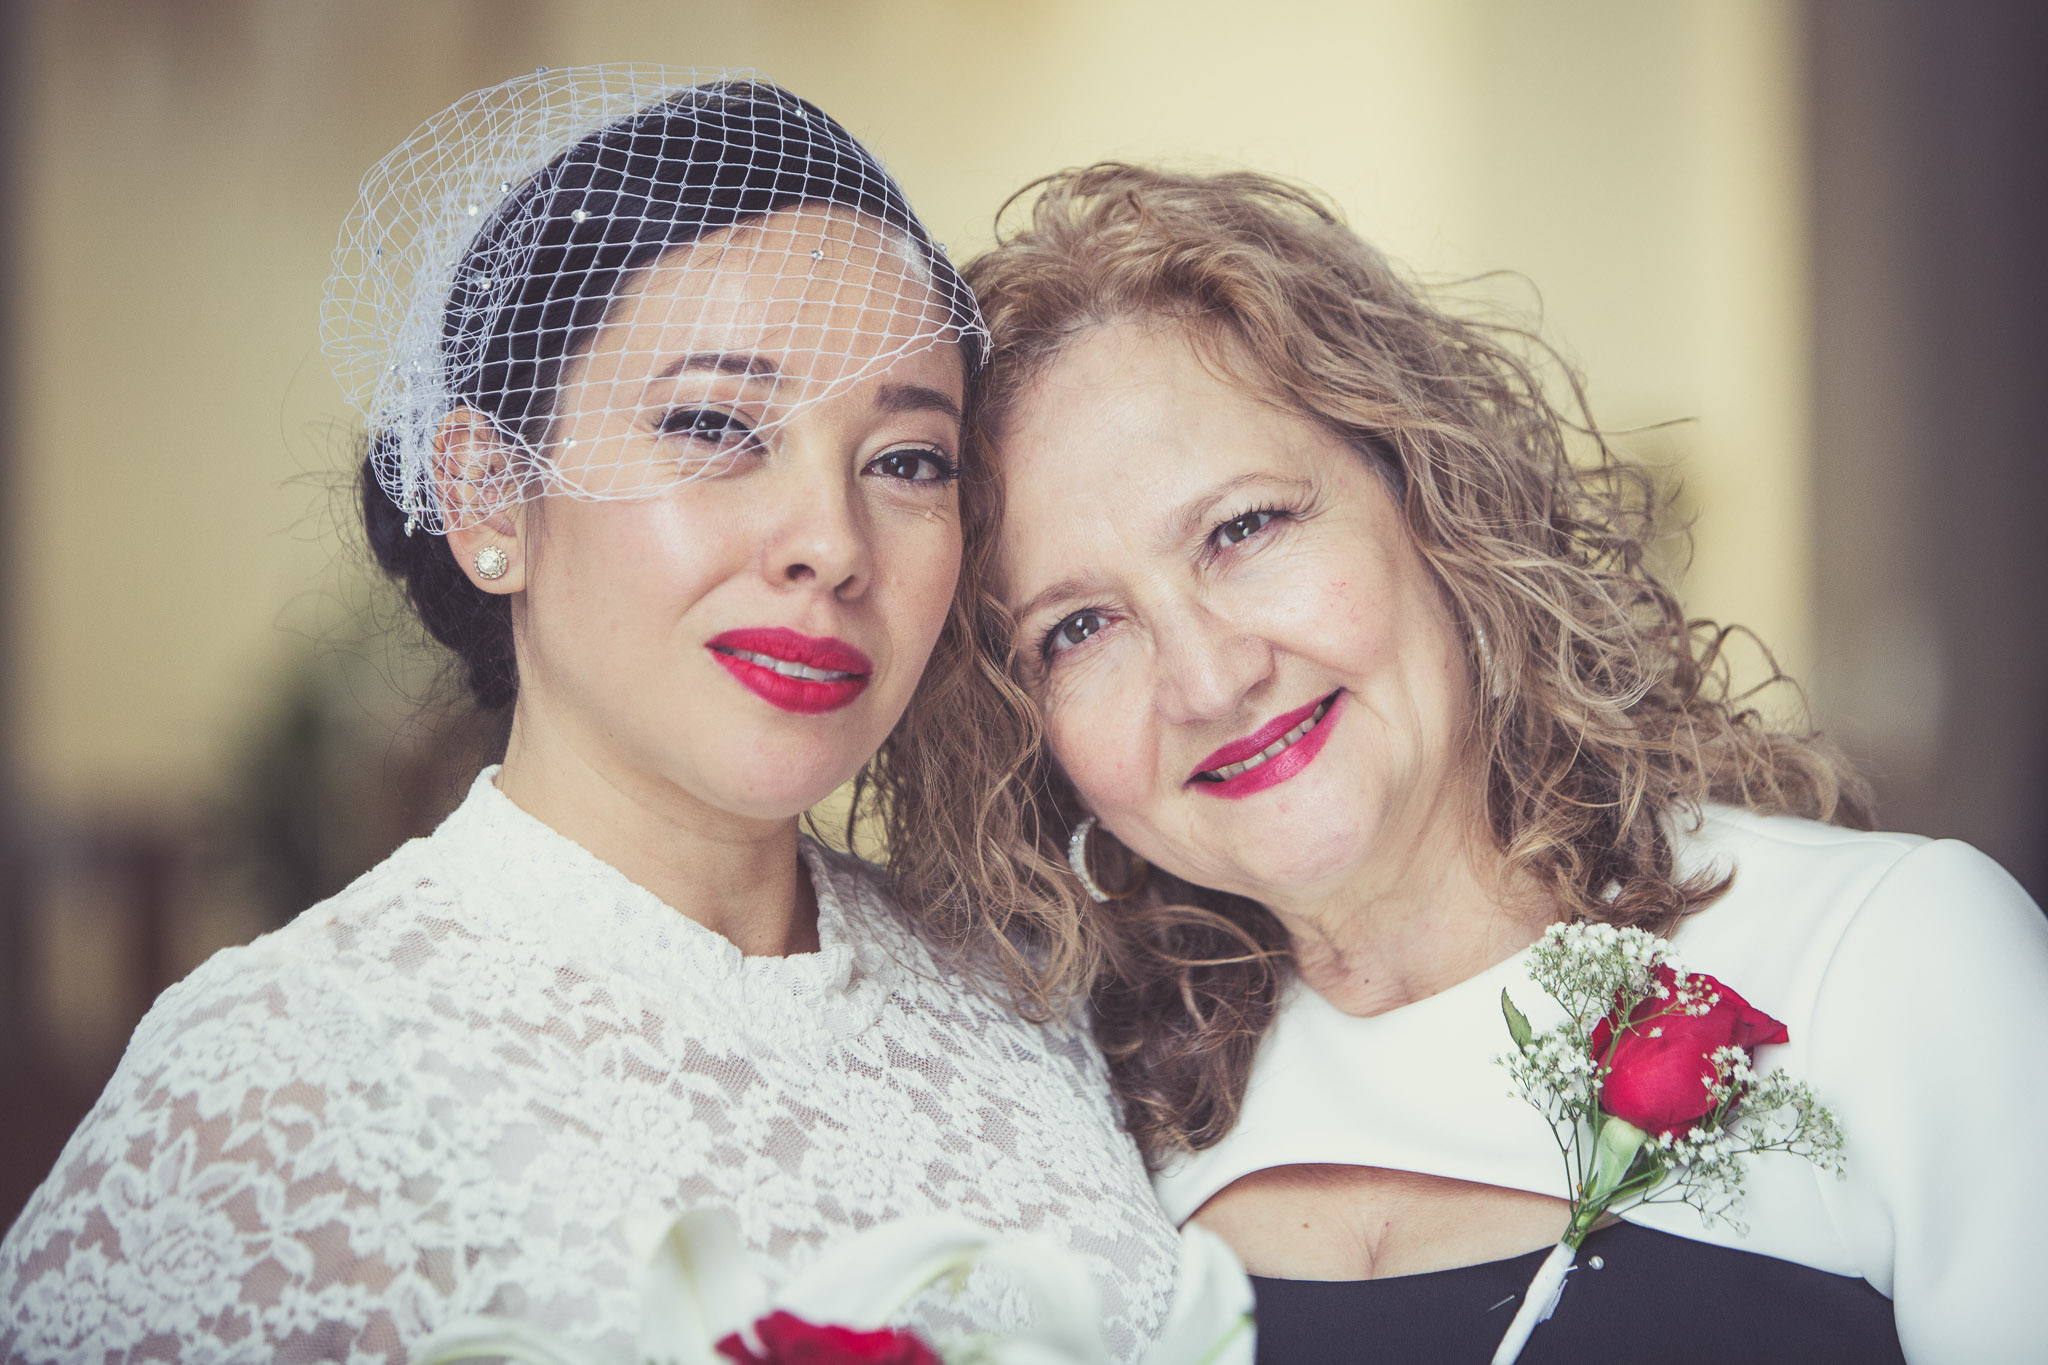 Geovanna-JP-wedding-shayne-gray-web-2499.jpg